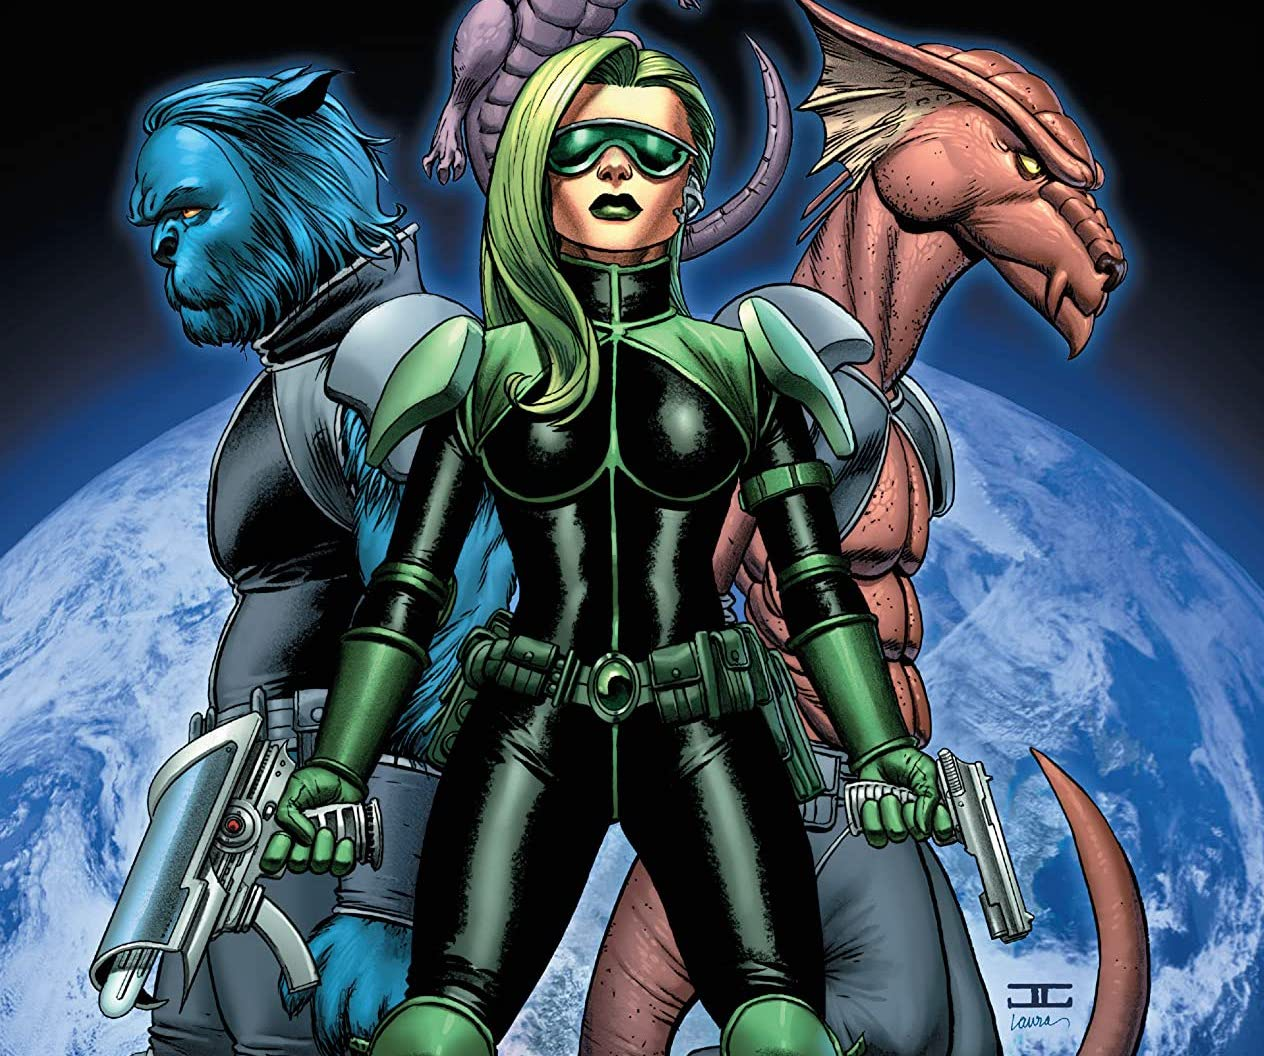 X-Men: S.W.O.R.D. - No Time To Breathe